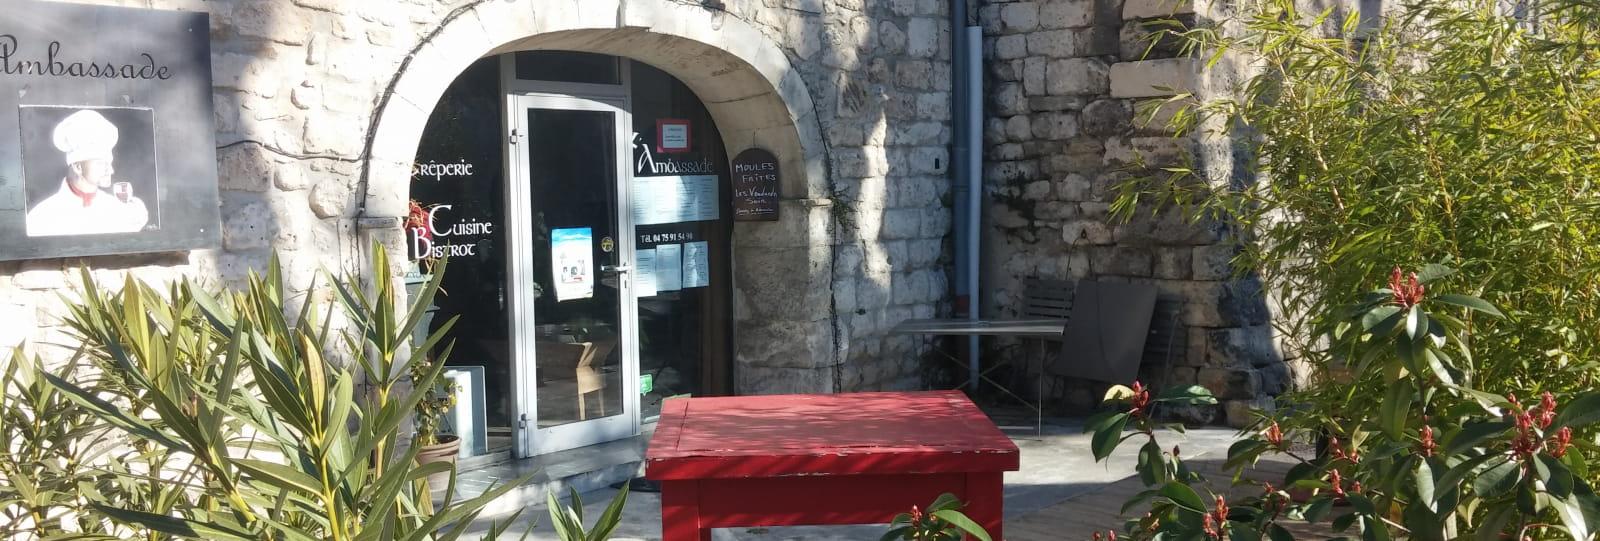 Restaurant L'Ambassade